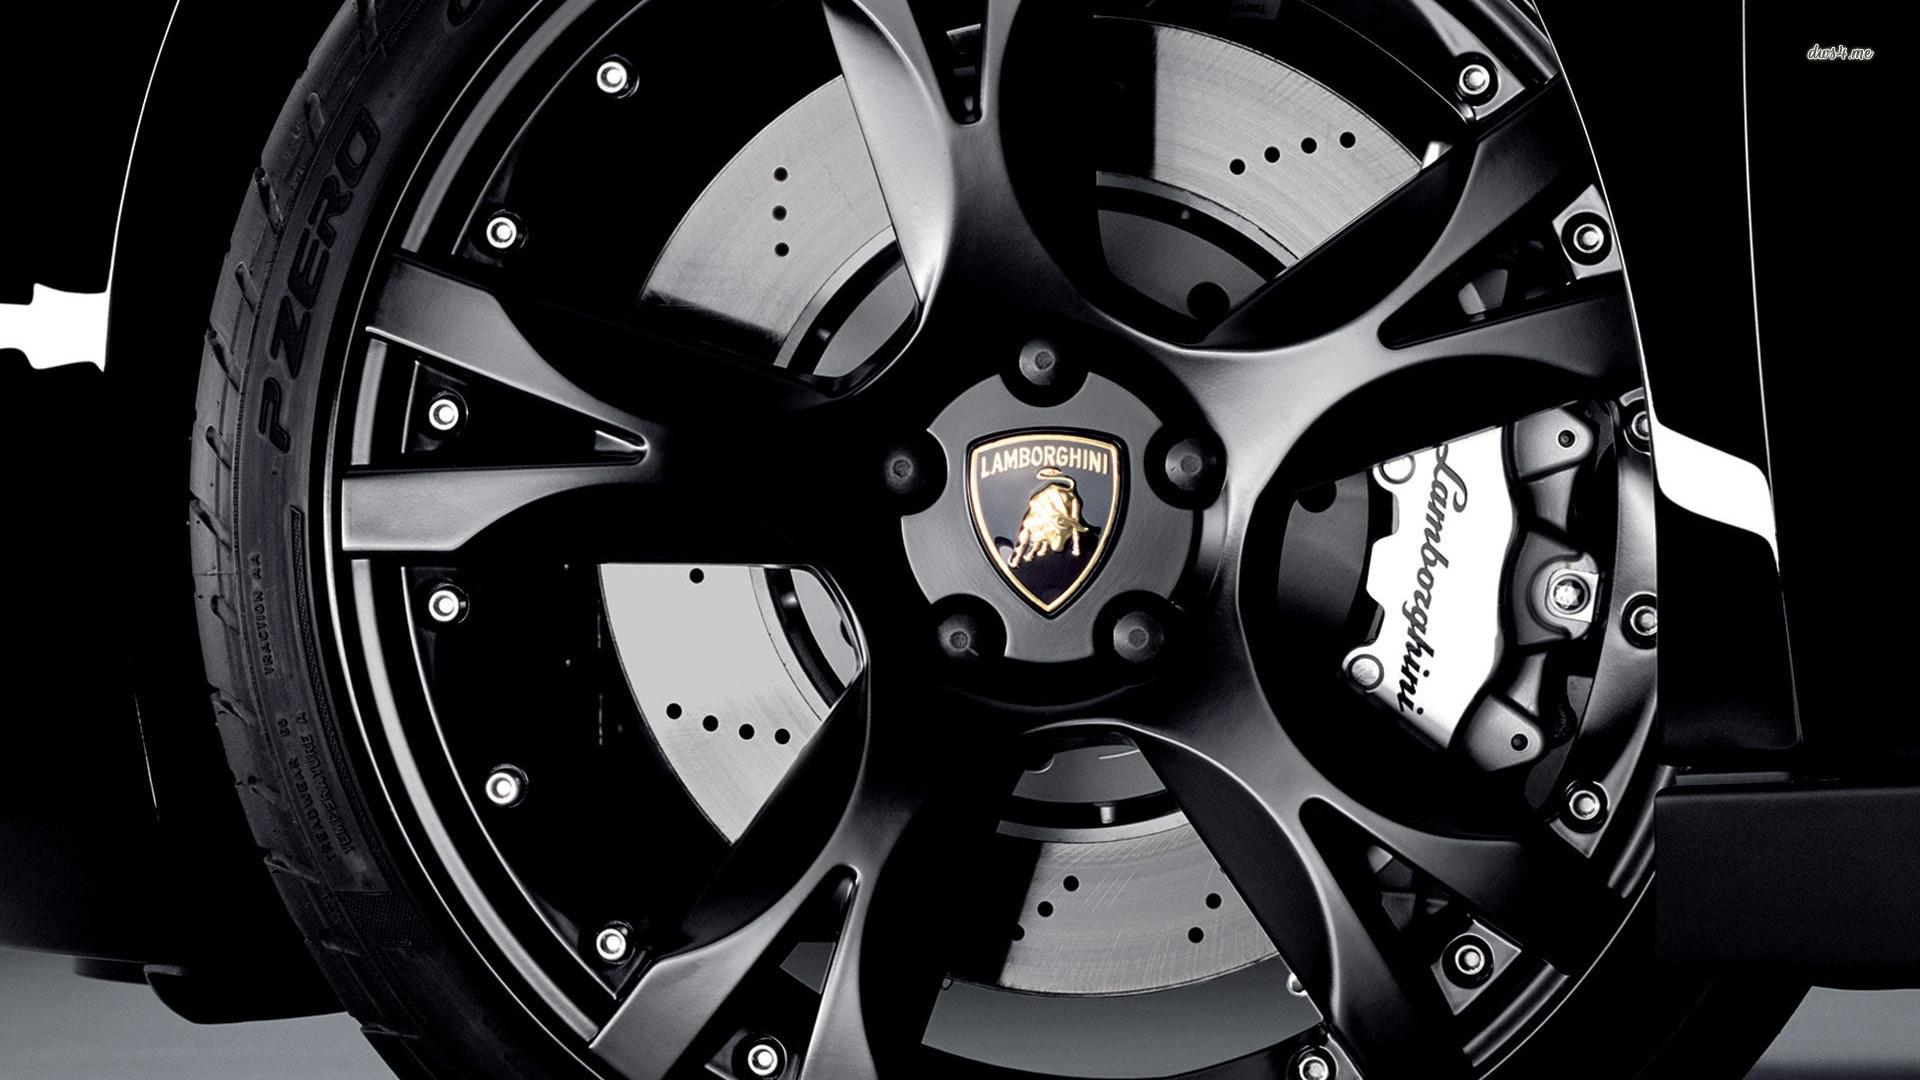 Black Monochrome Car Vehicle Lamborghini Sports Tire Steering Wheel Rim Supercar Emblem Automotive Design